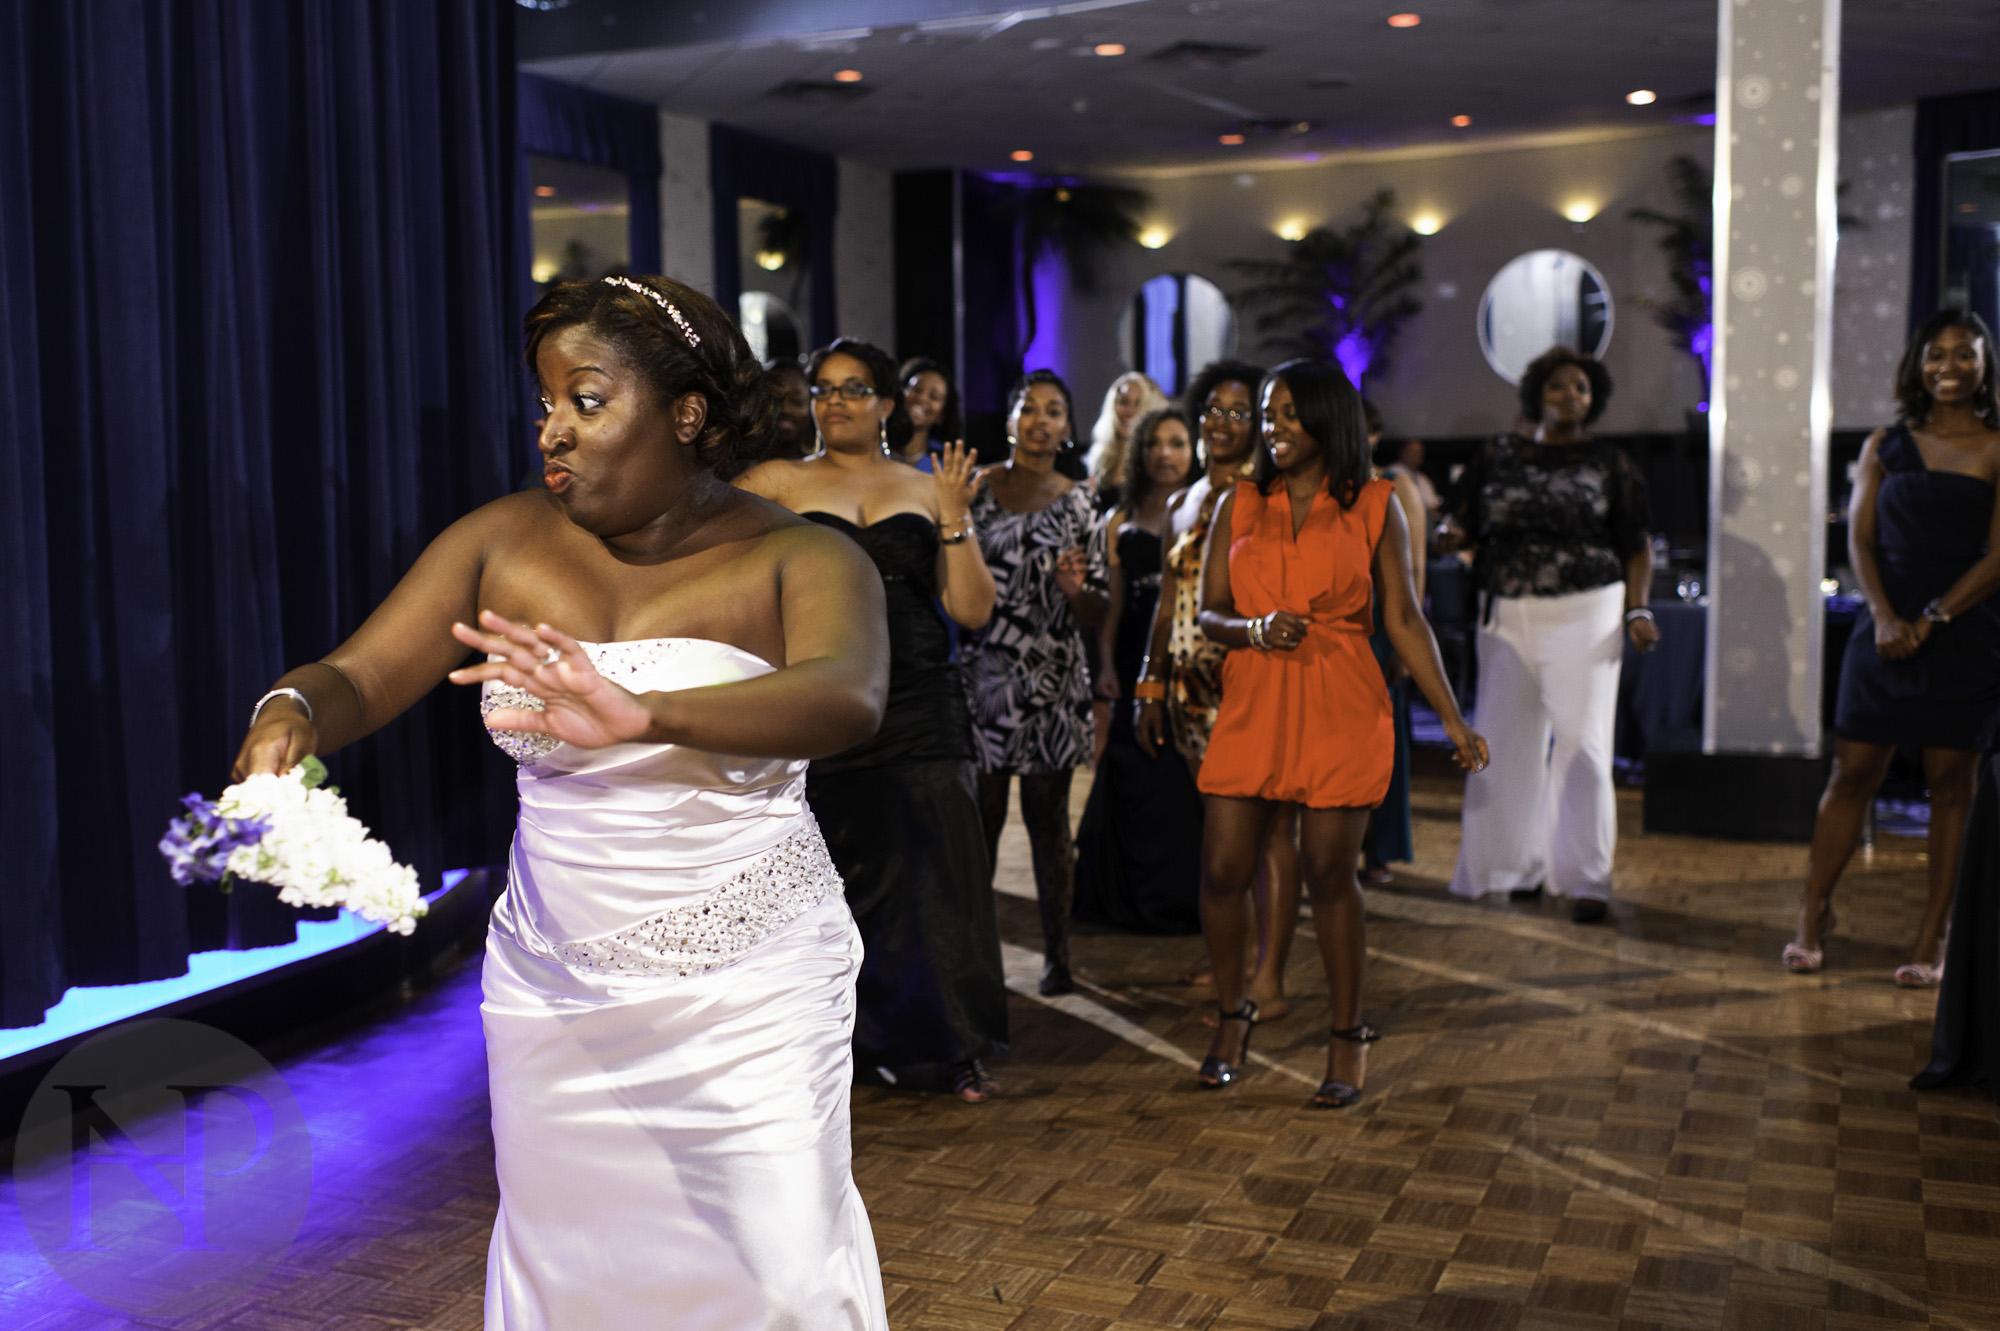 wedding photography dc photographer - district of columbia photography weddingphoto 2012_ denis kaleigh -  emerald isle - destination wedding - Rustin Kratel Carlyle Club Alexandria VA-68.jpg